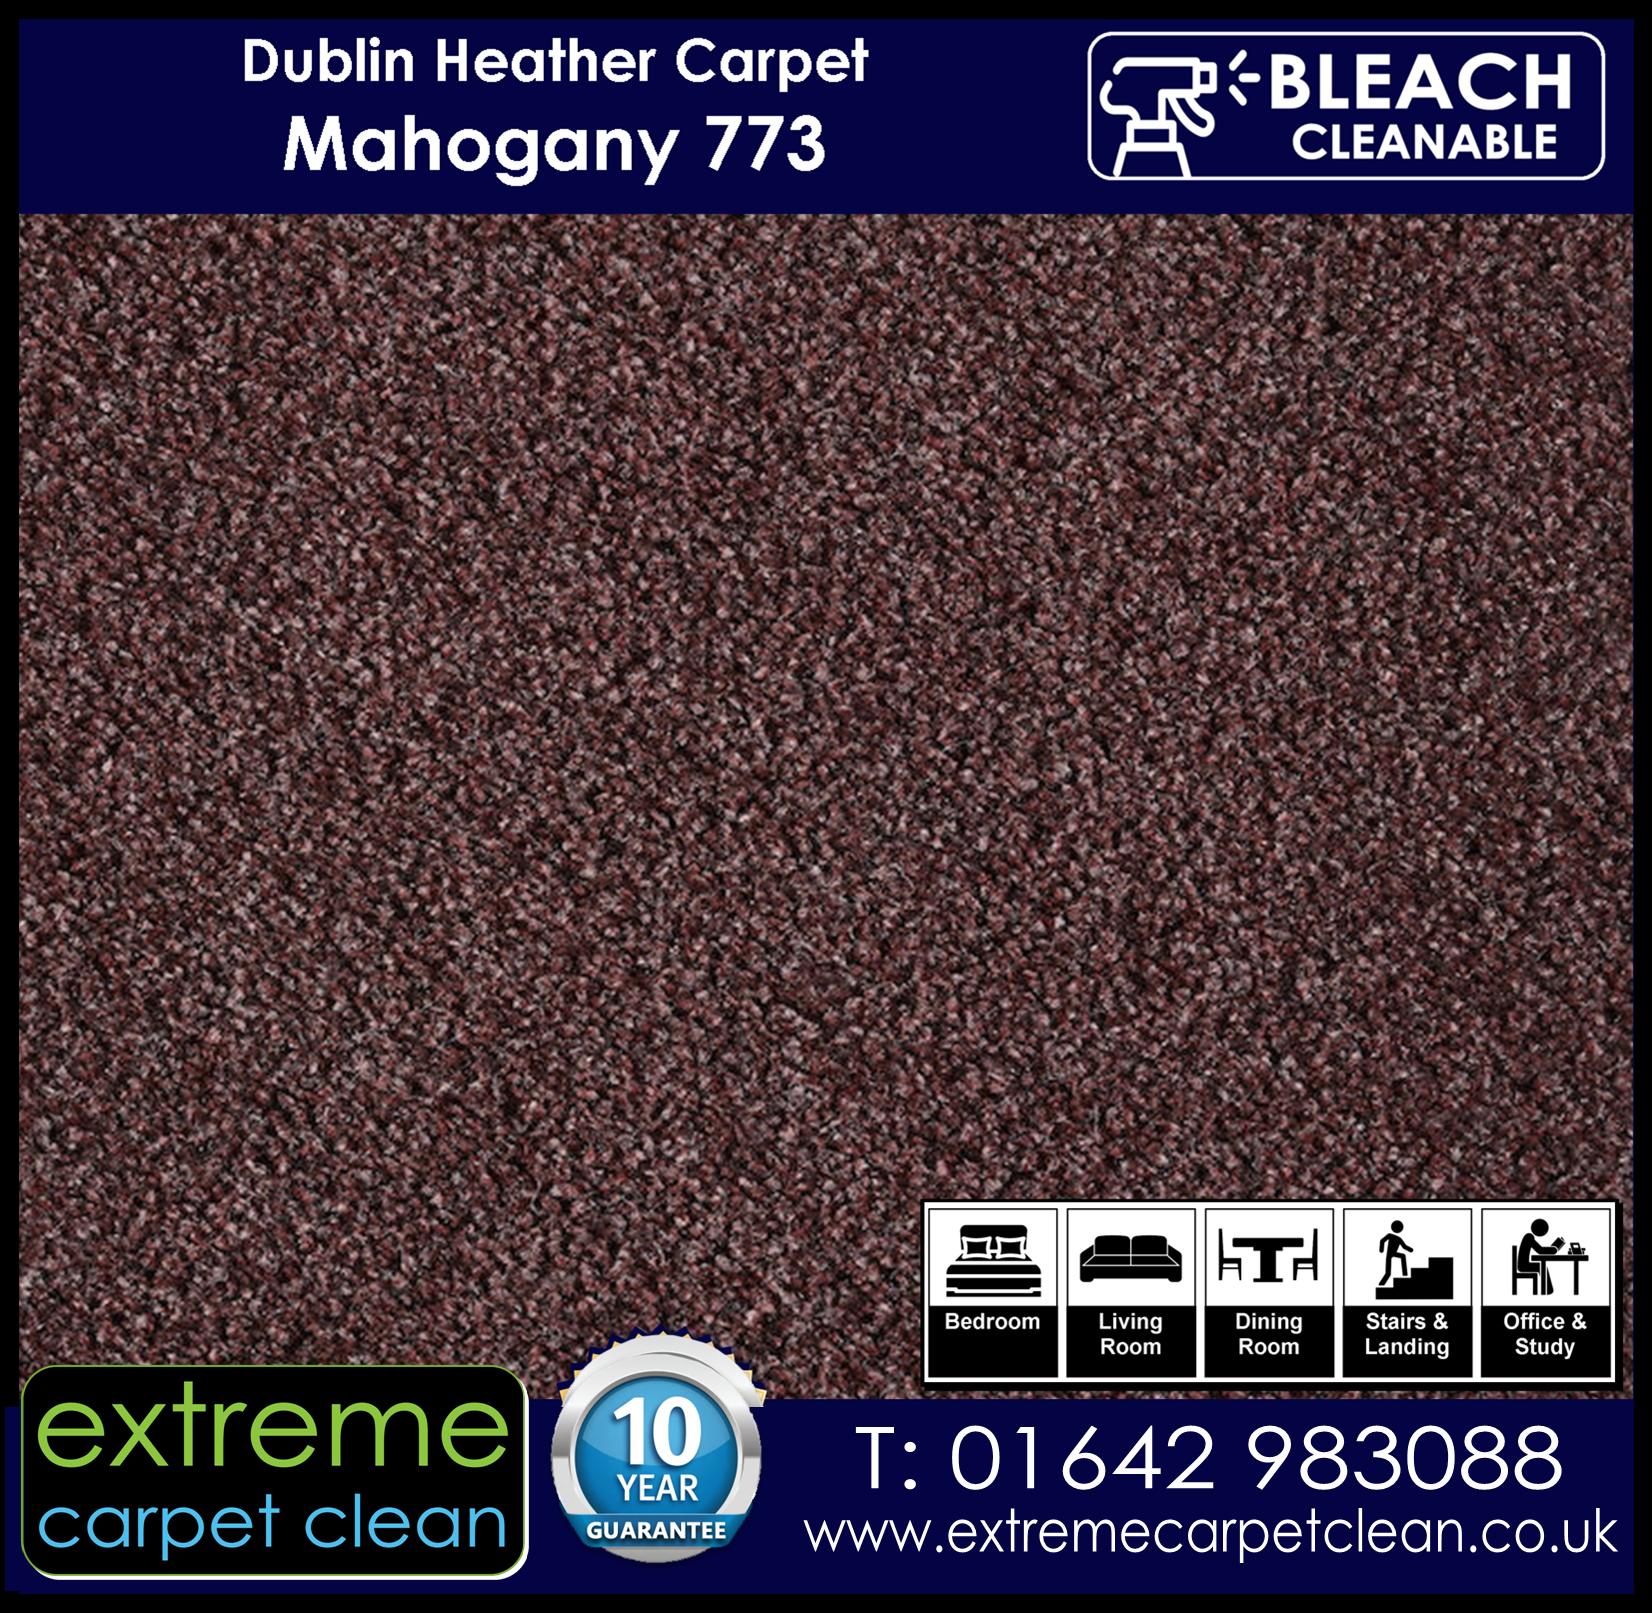 Dublin Heather Carpet Range. Mahogony 773 Extreme Carpet Clean